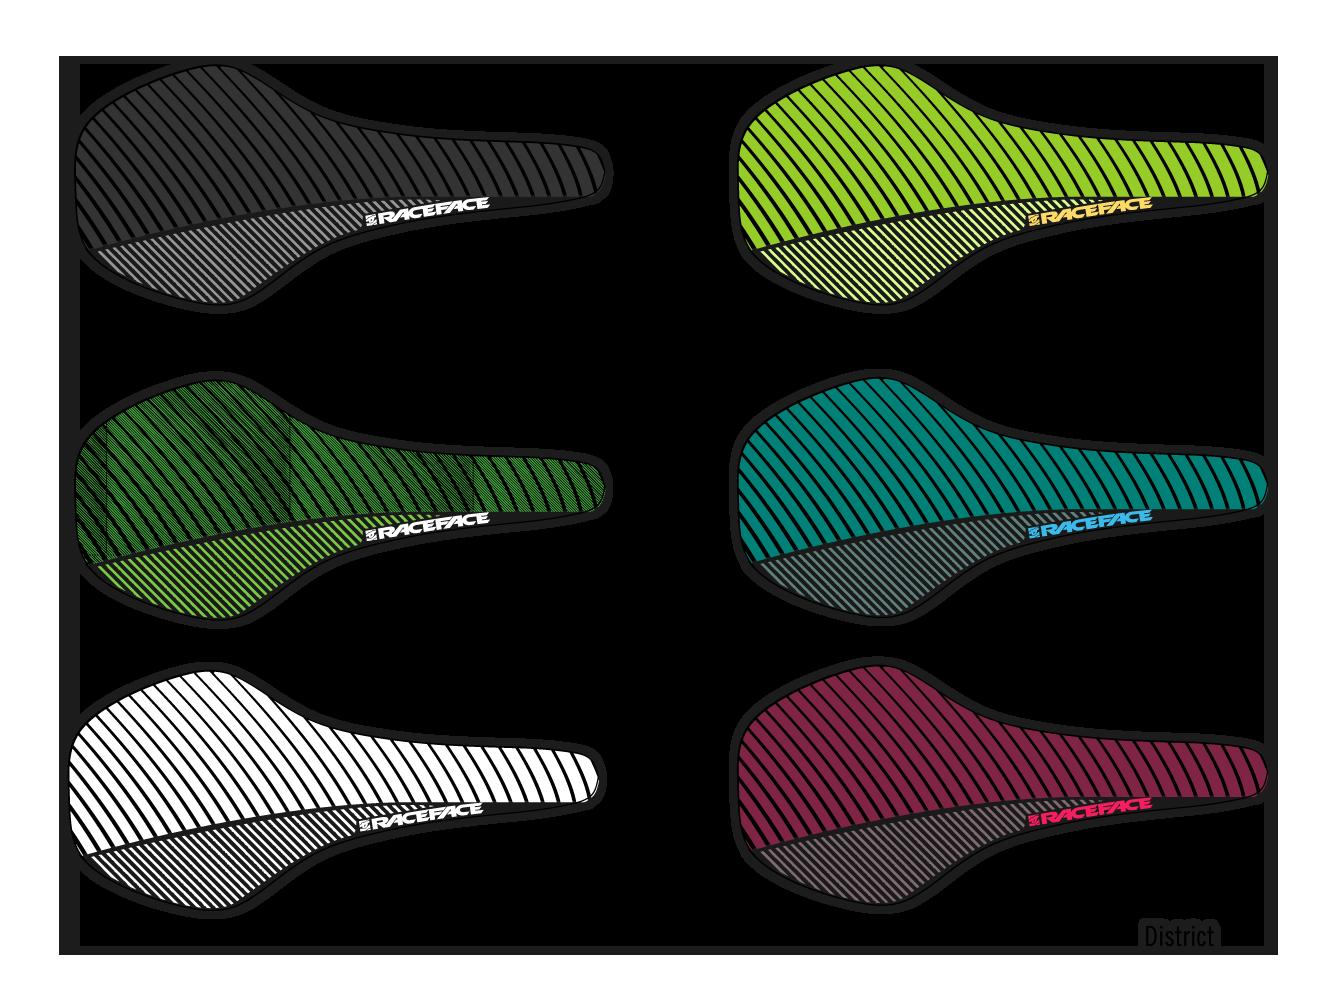 Saddle Concepts